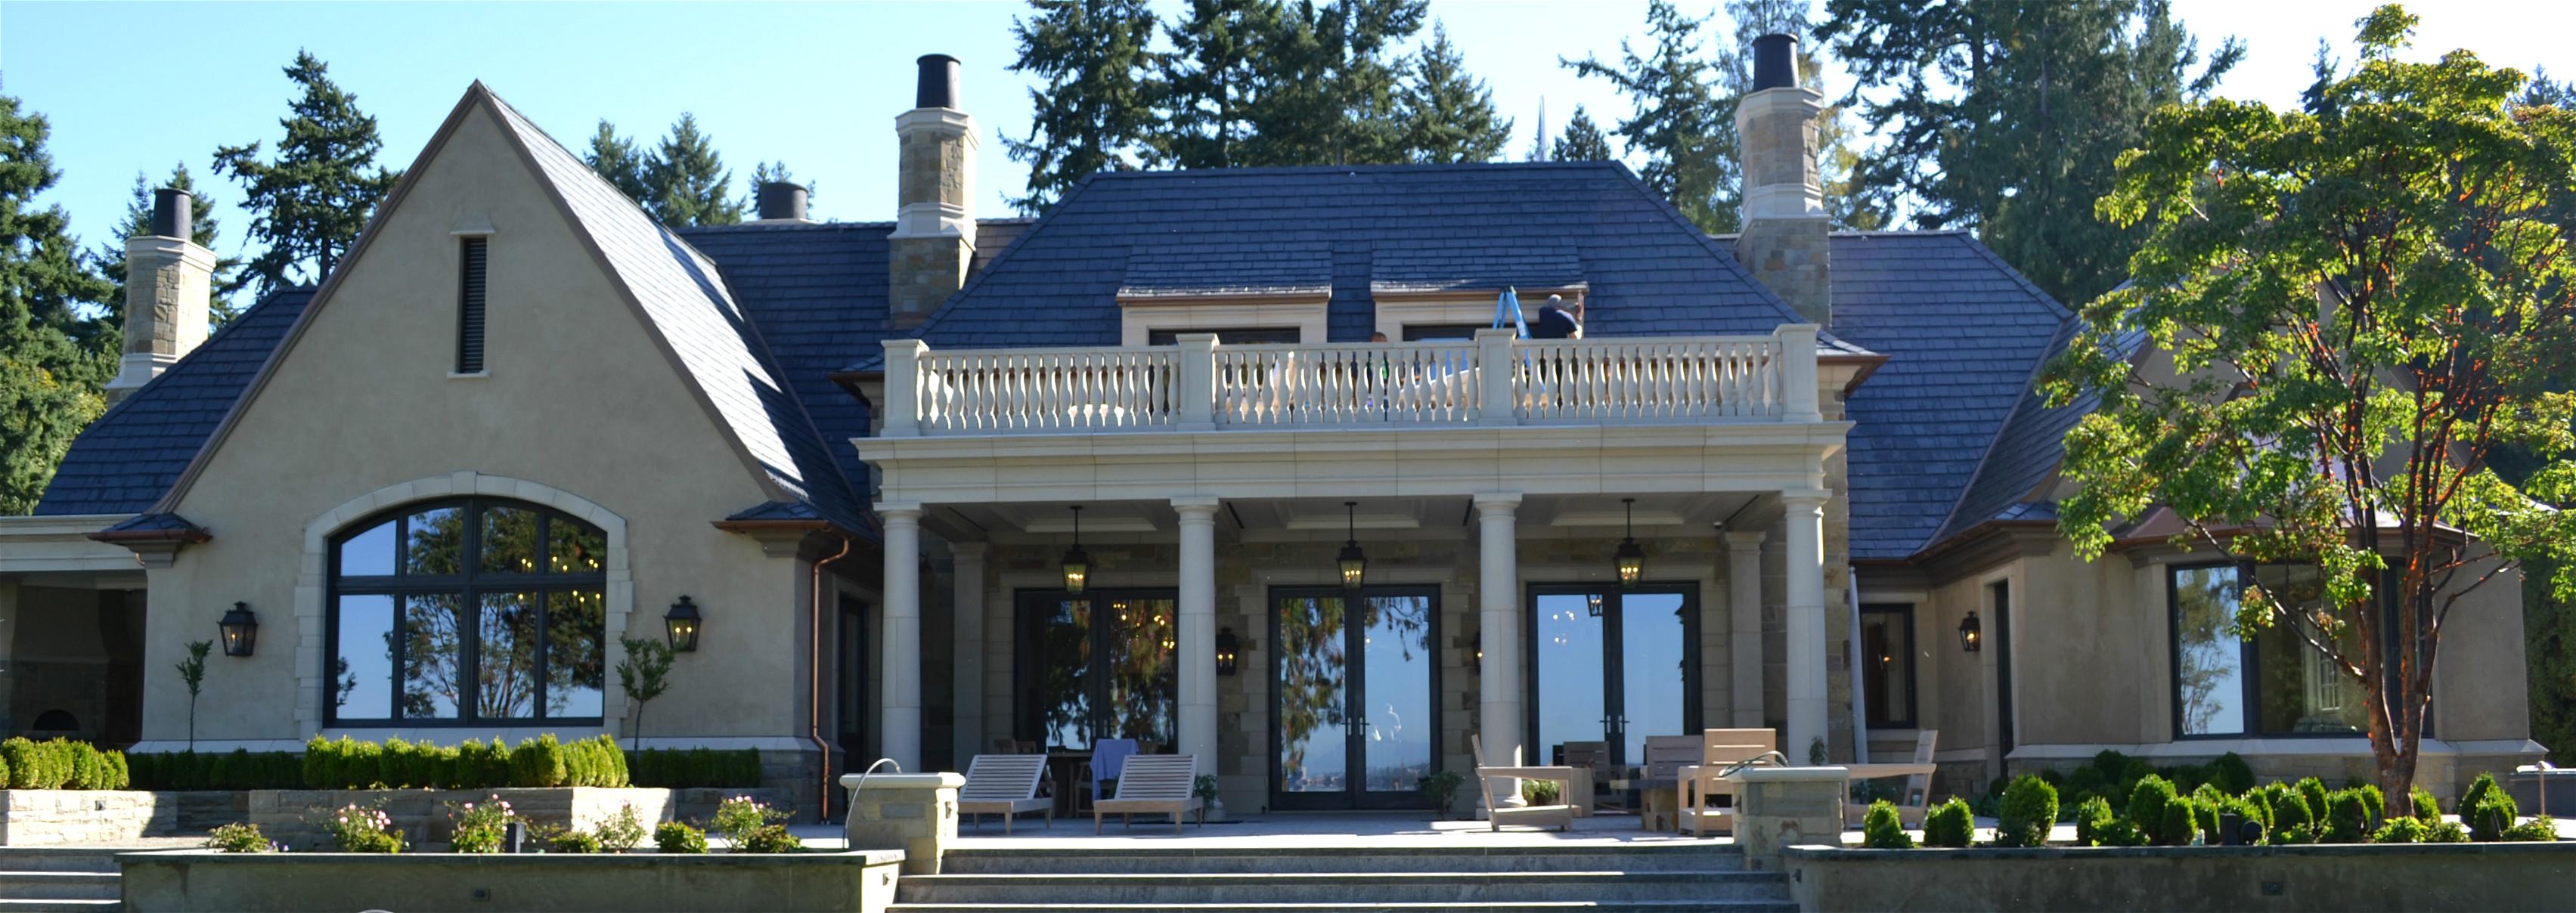 Lueder stone, custom stone  house